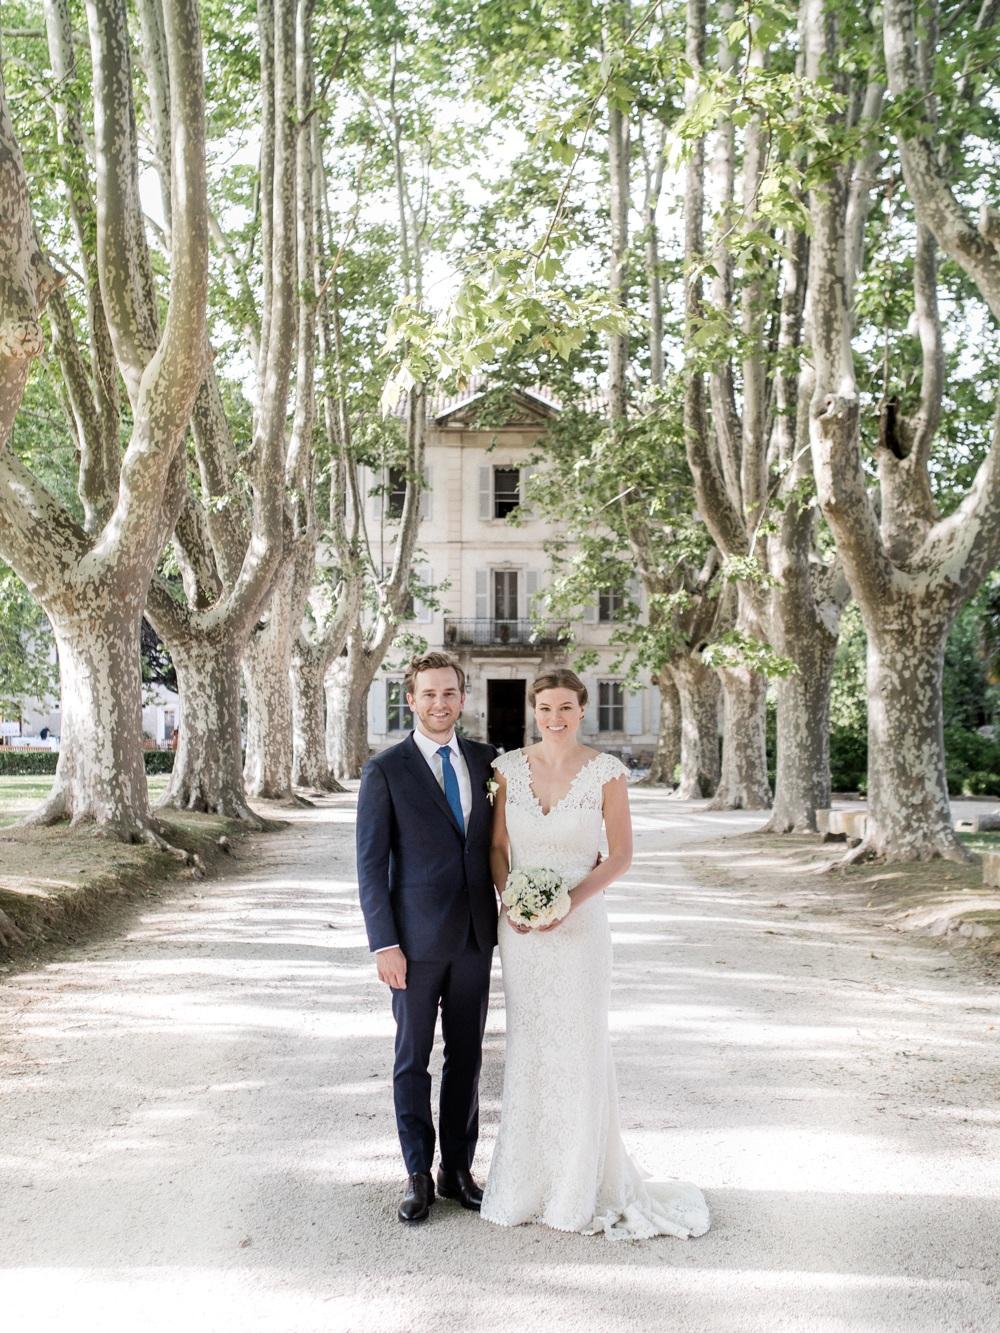 Provence_Wedding_(c)_Rory_Wylie-101.jpg